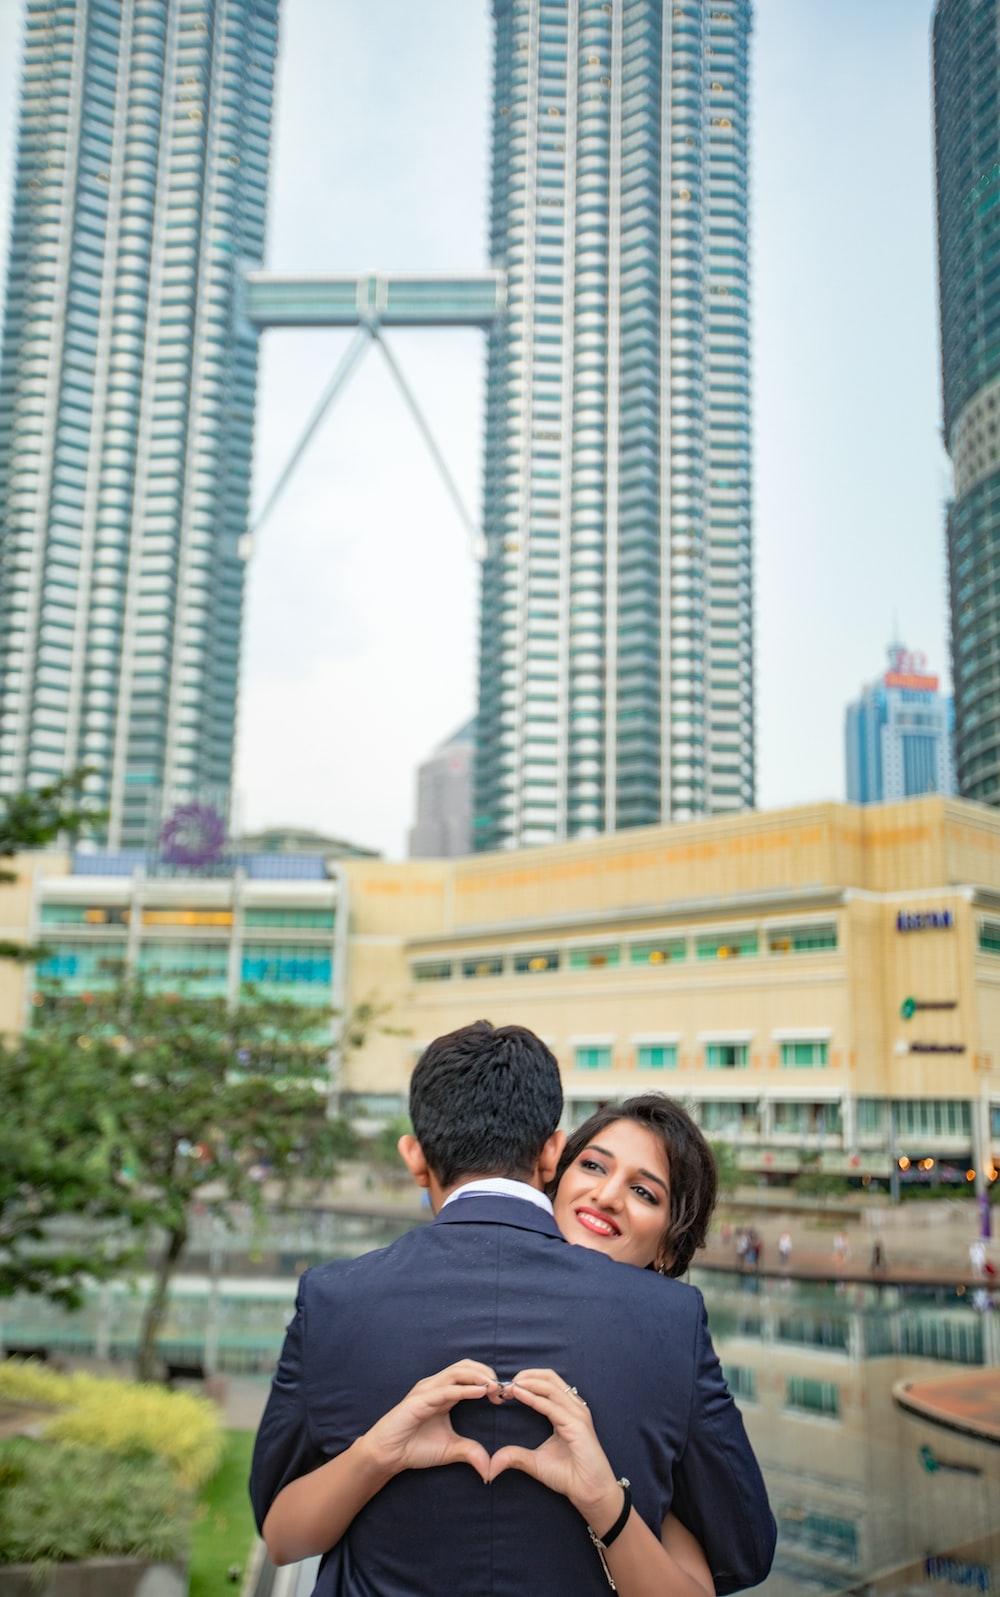 man hugging woman near Petronas Towers, Malaysia